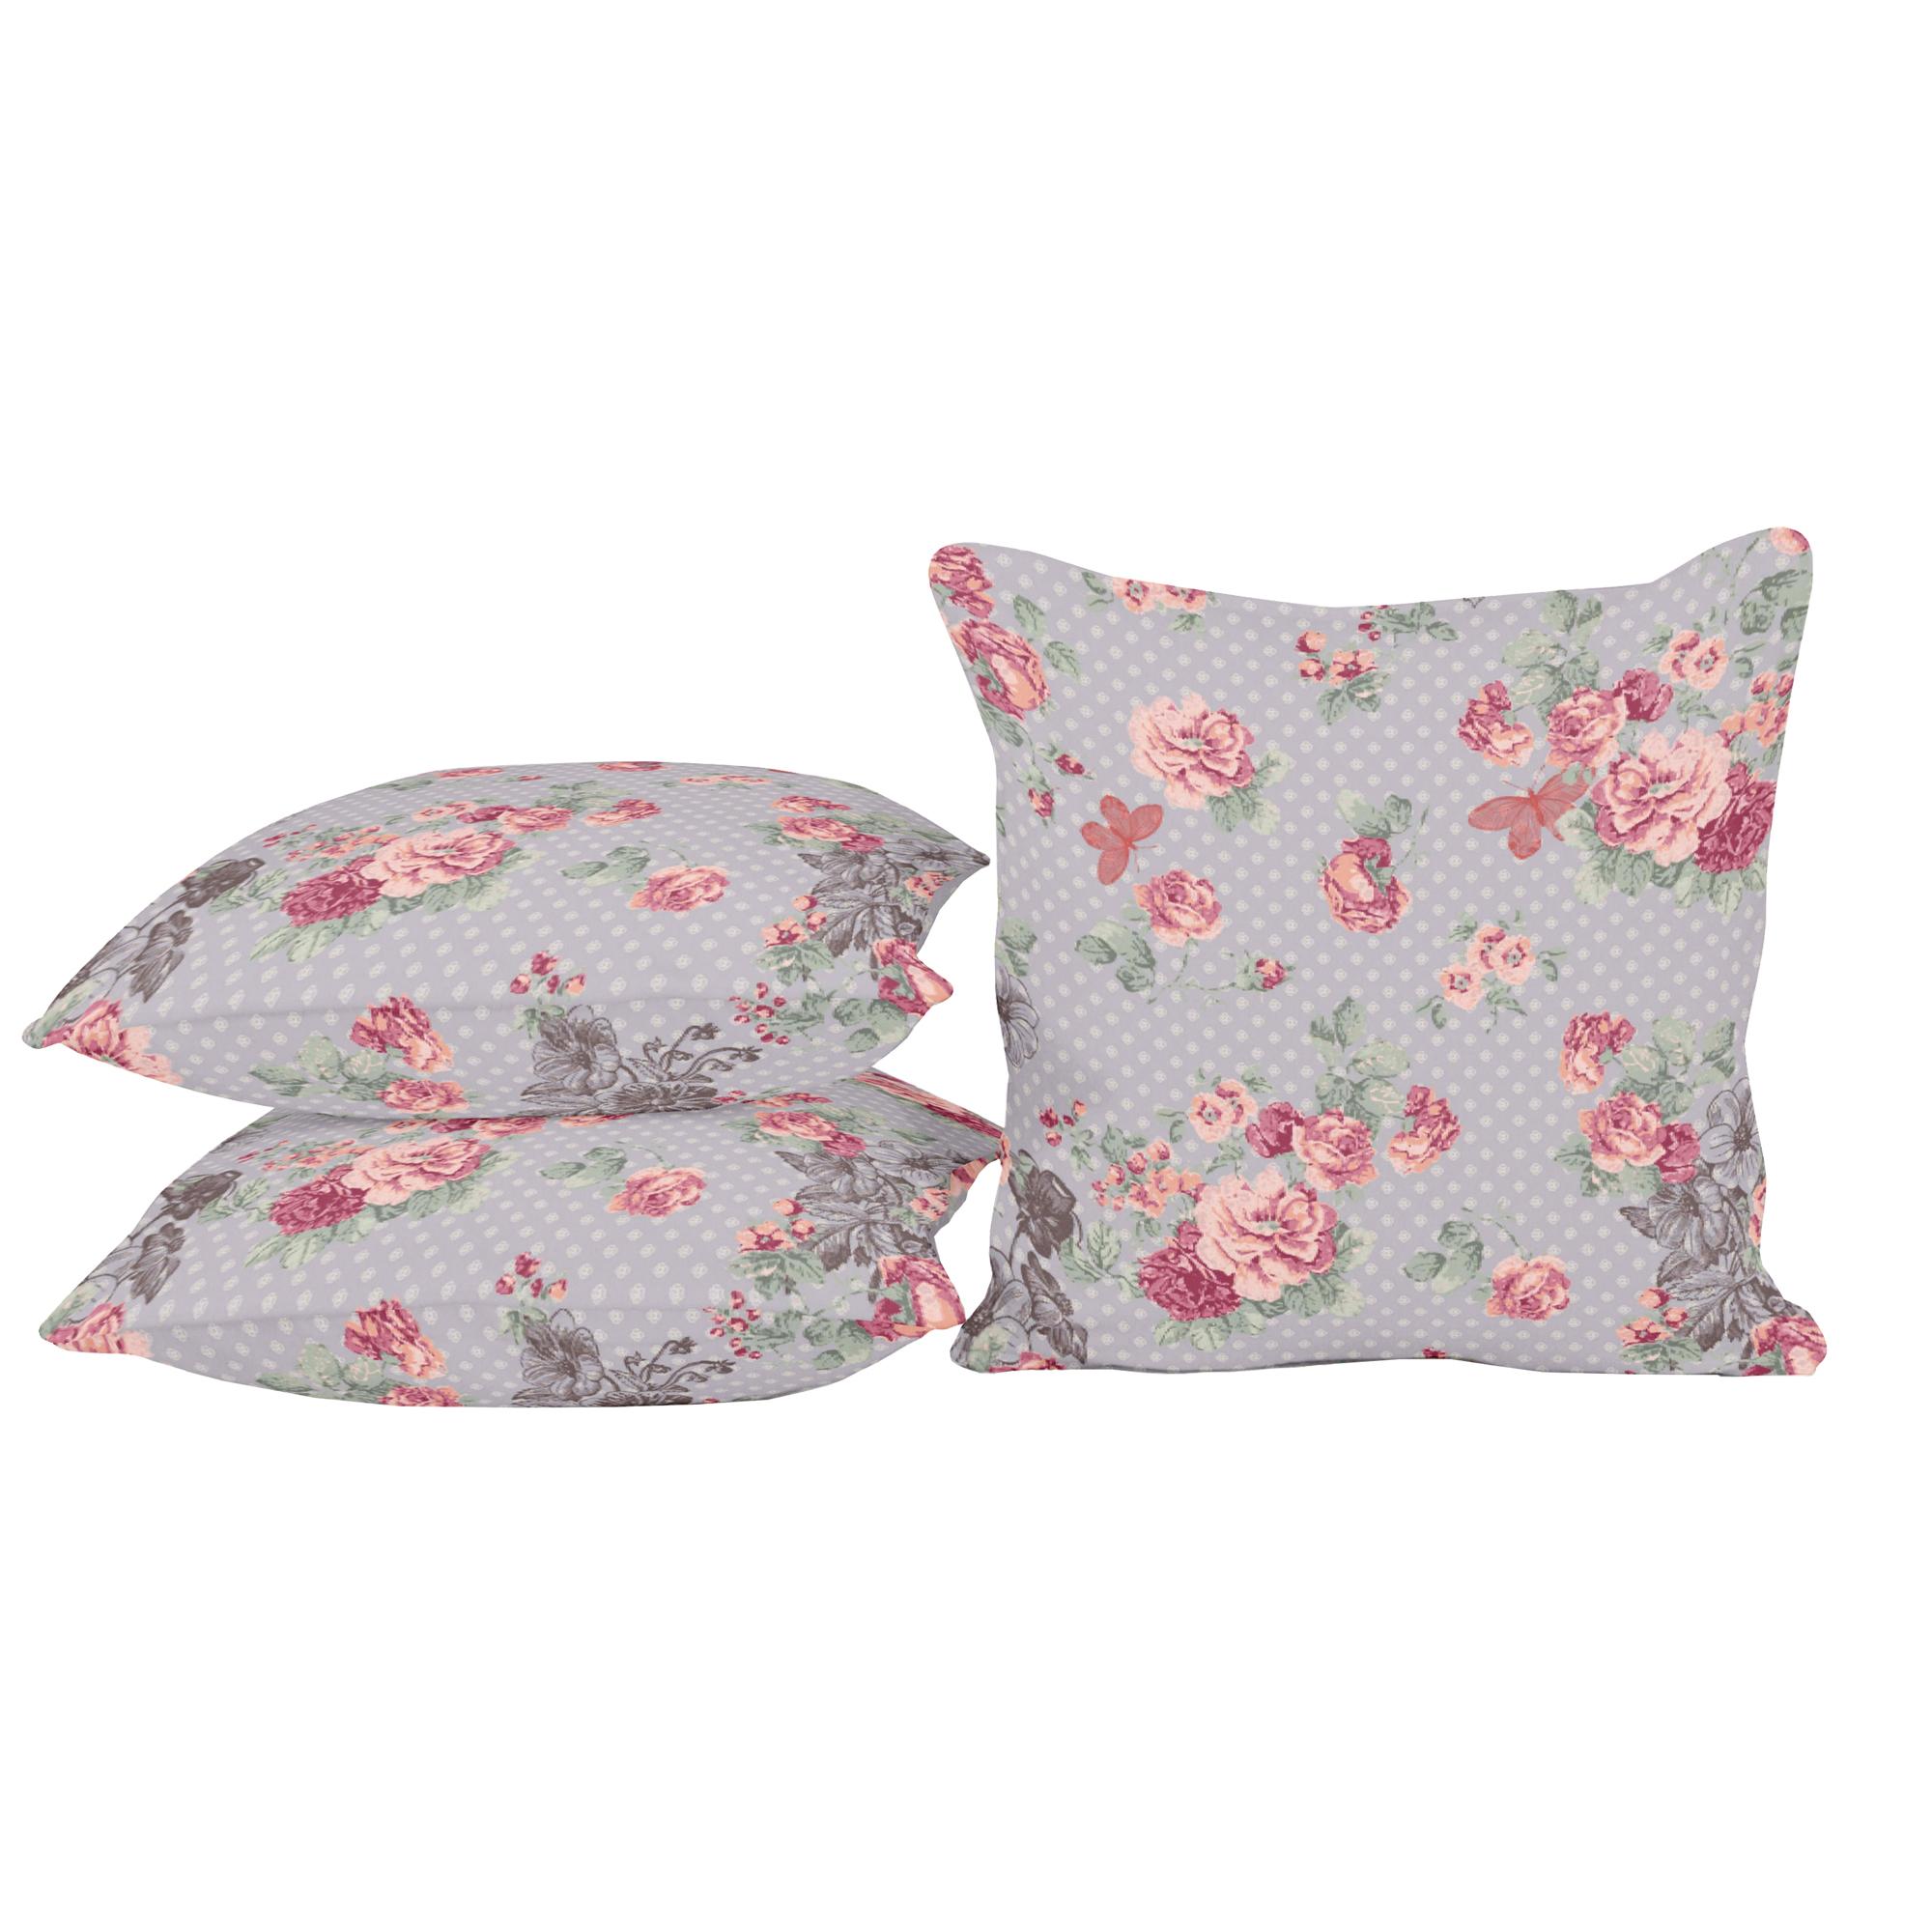 sitzkissen kissen outdoor wetterfest 50x50 cm zierkissen. Black Bedroom Furniture Sets. Home Design Ideas